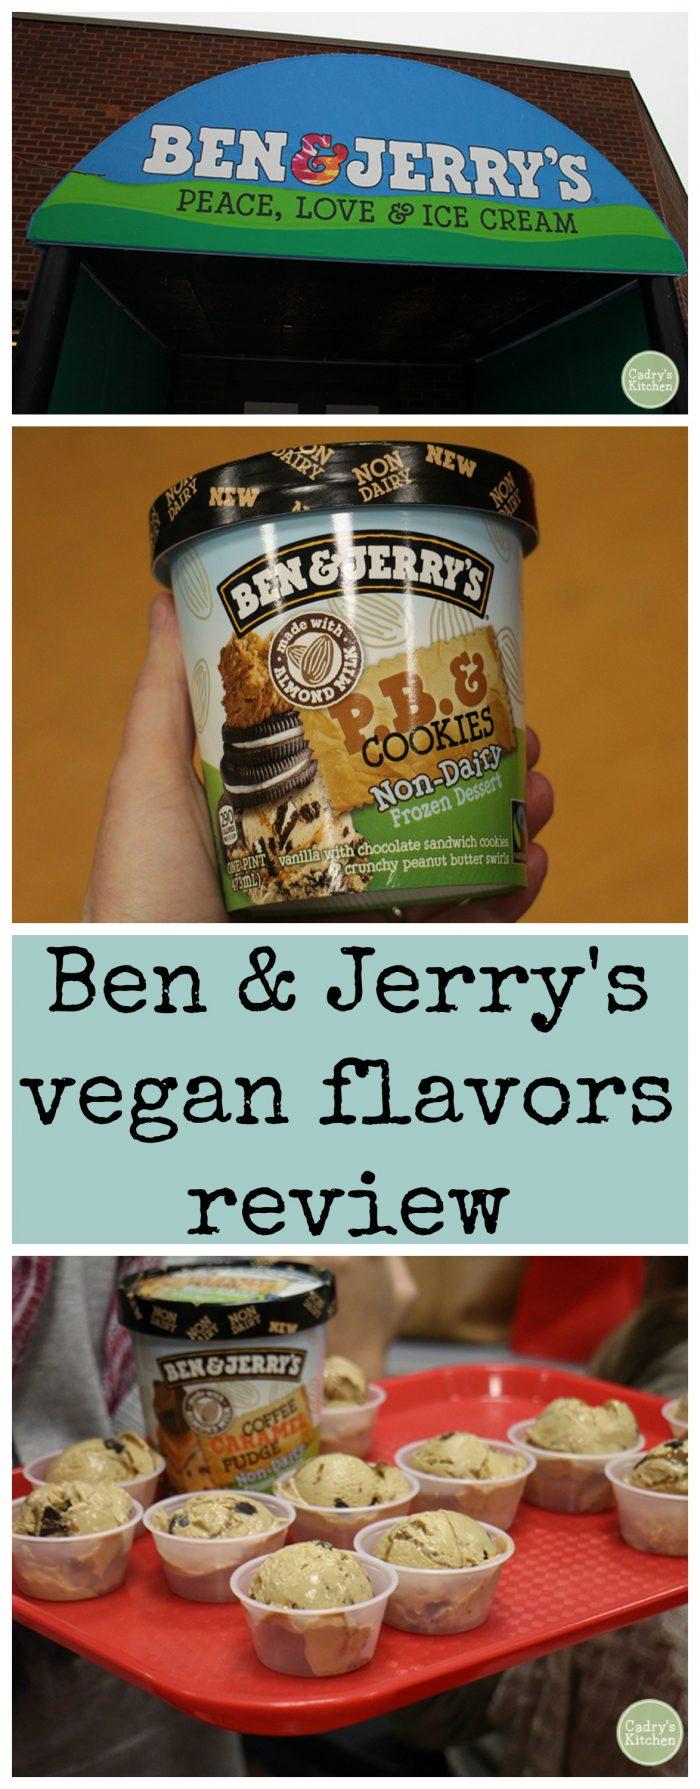 Ben and Jerry's new vegan ice cream - Review & video! | cadryskitchen.com